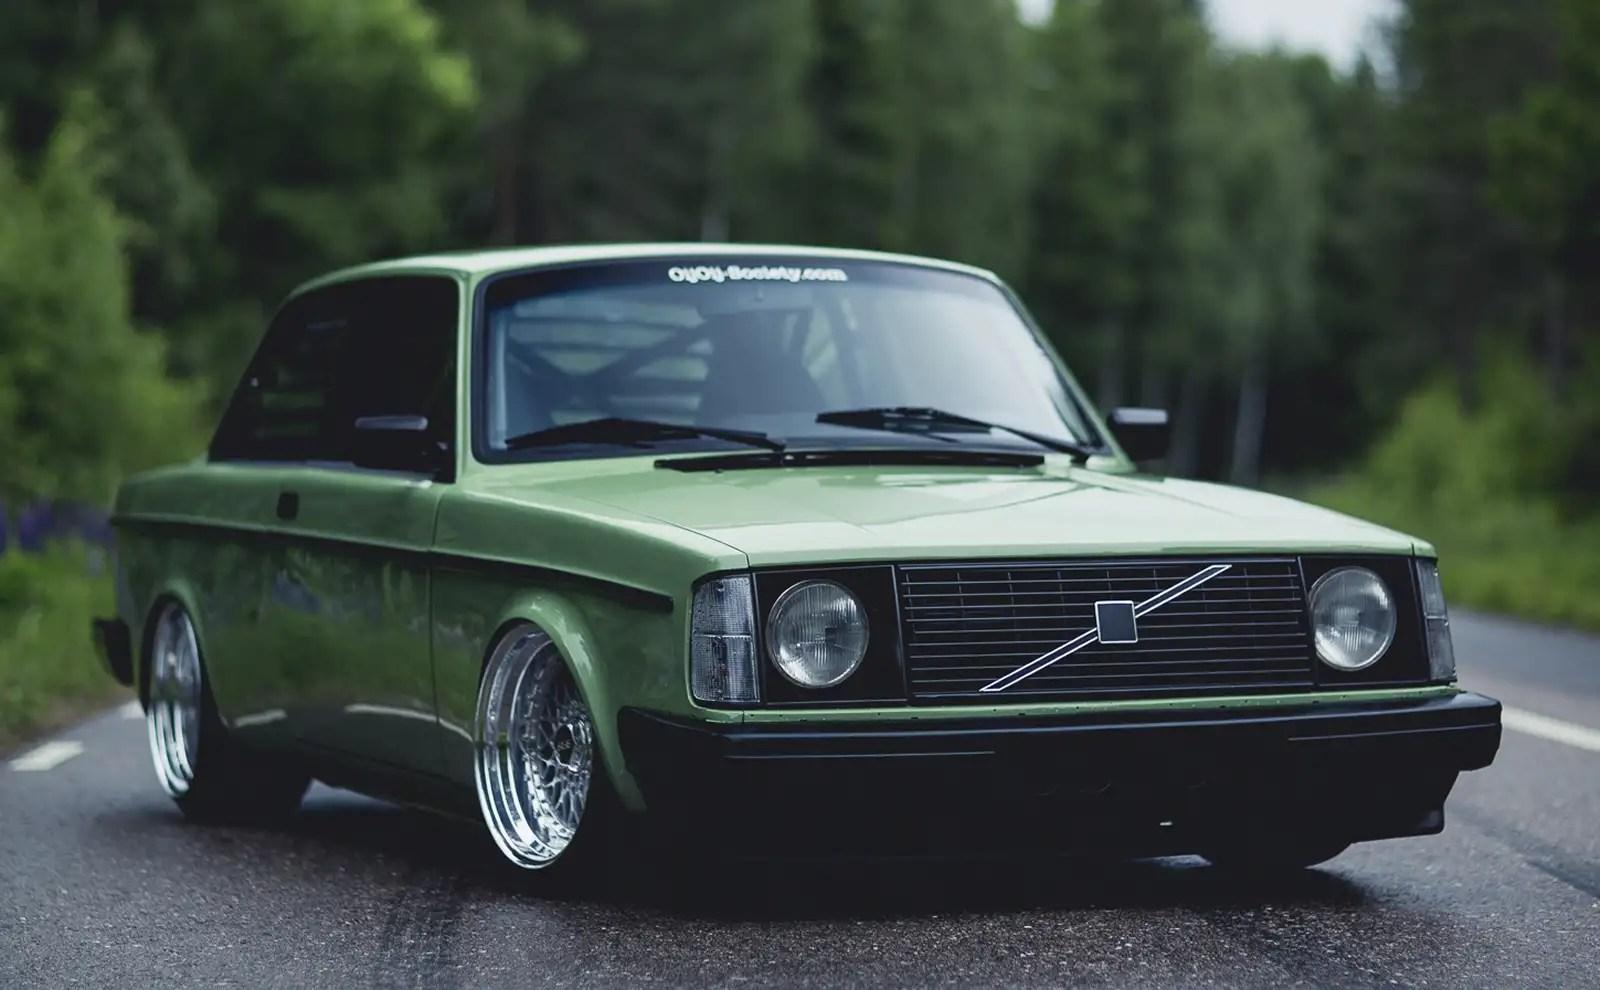 1992 940 Gl Wiring Diagram Volvo 242 Custom By Patrick Lindgren Used Daewoo Cars